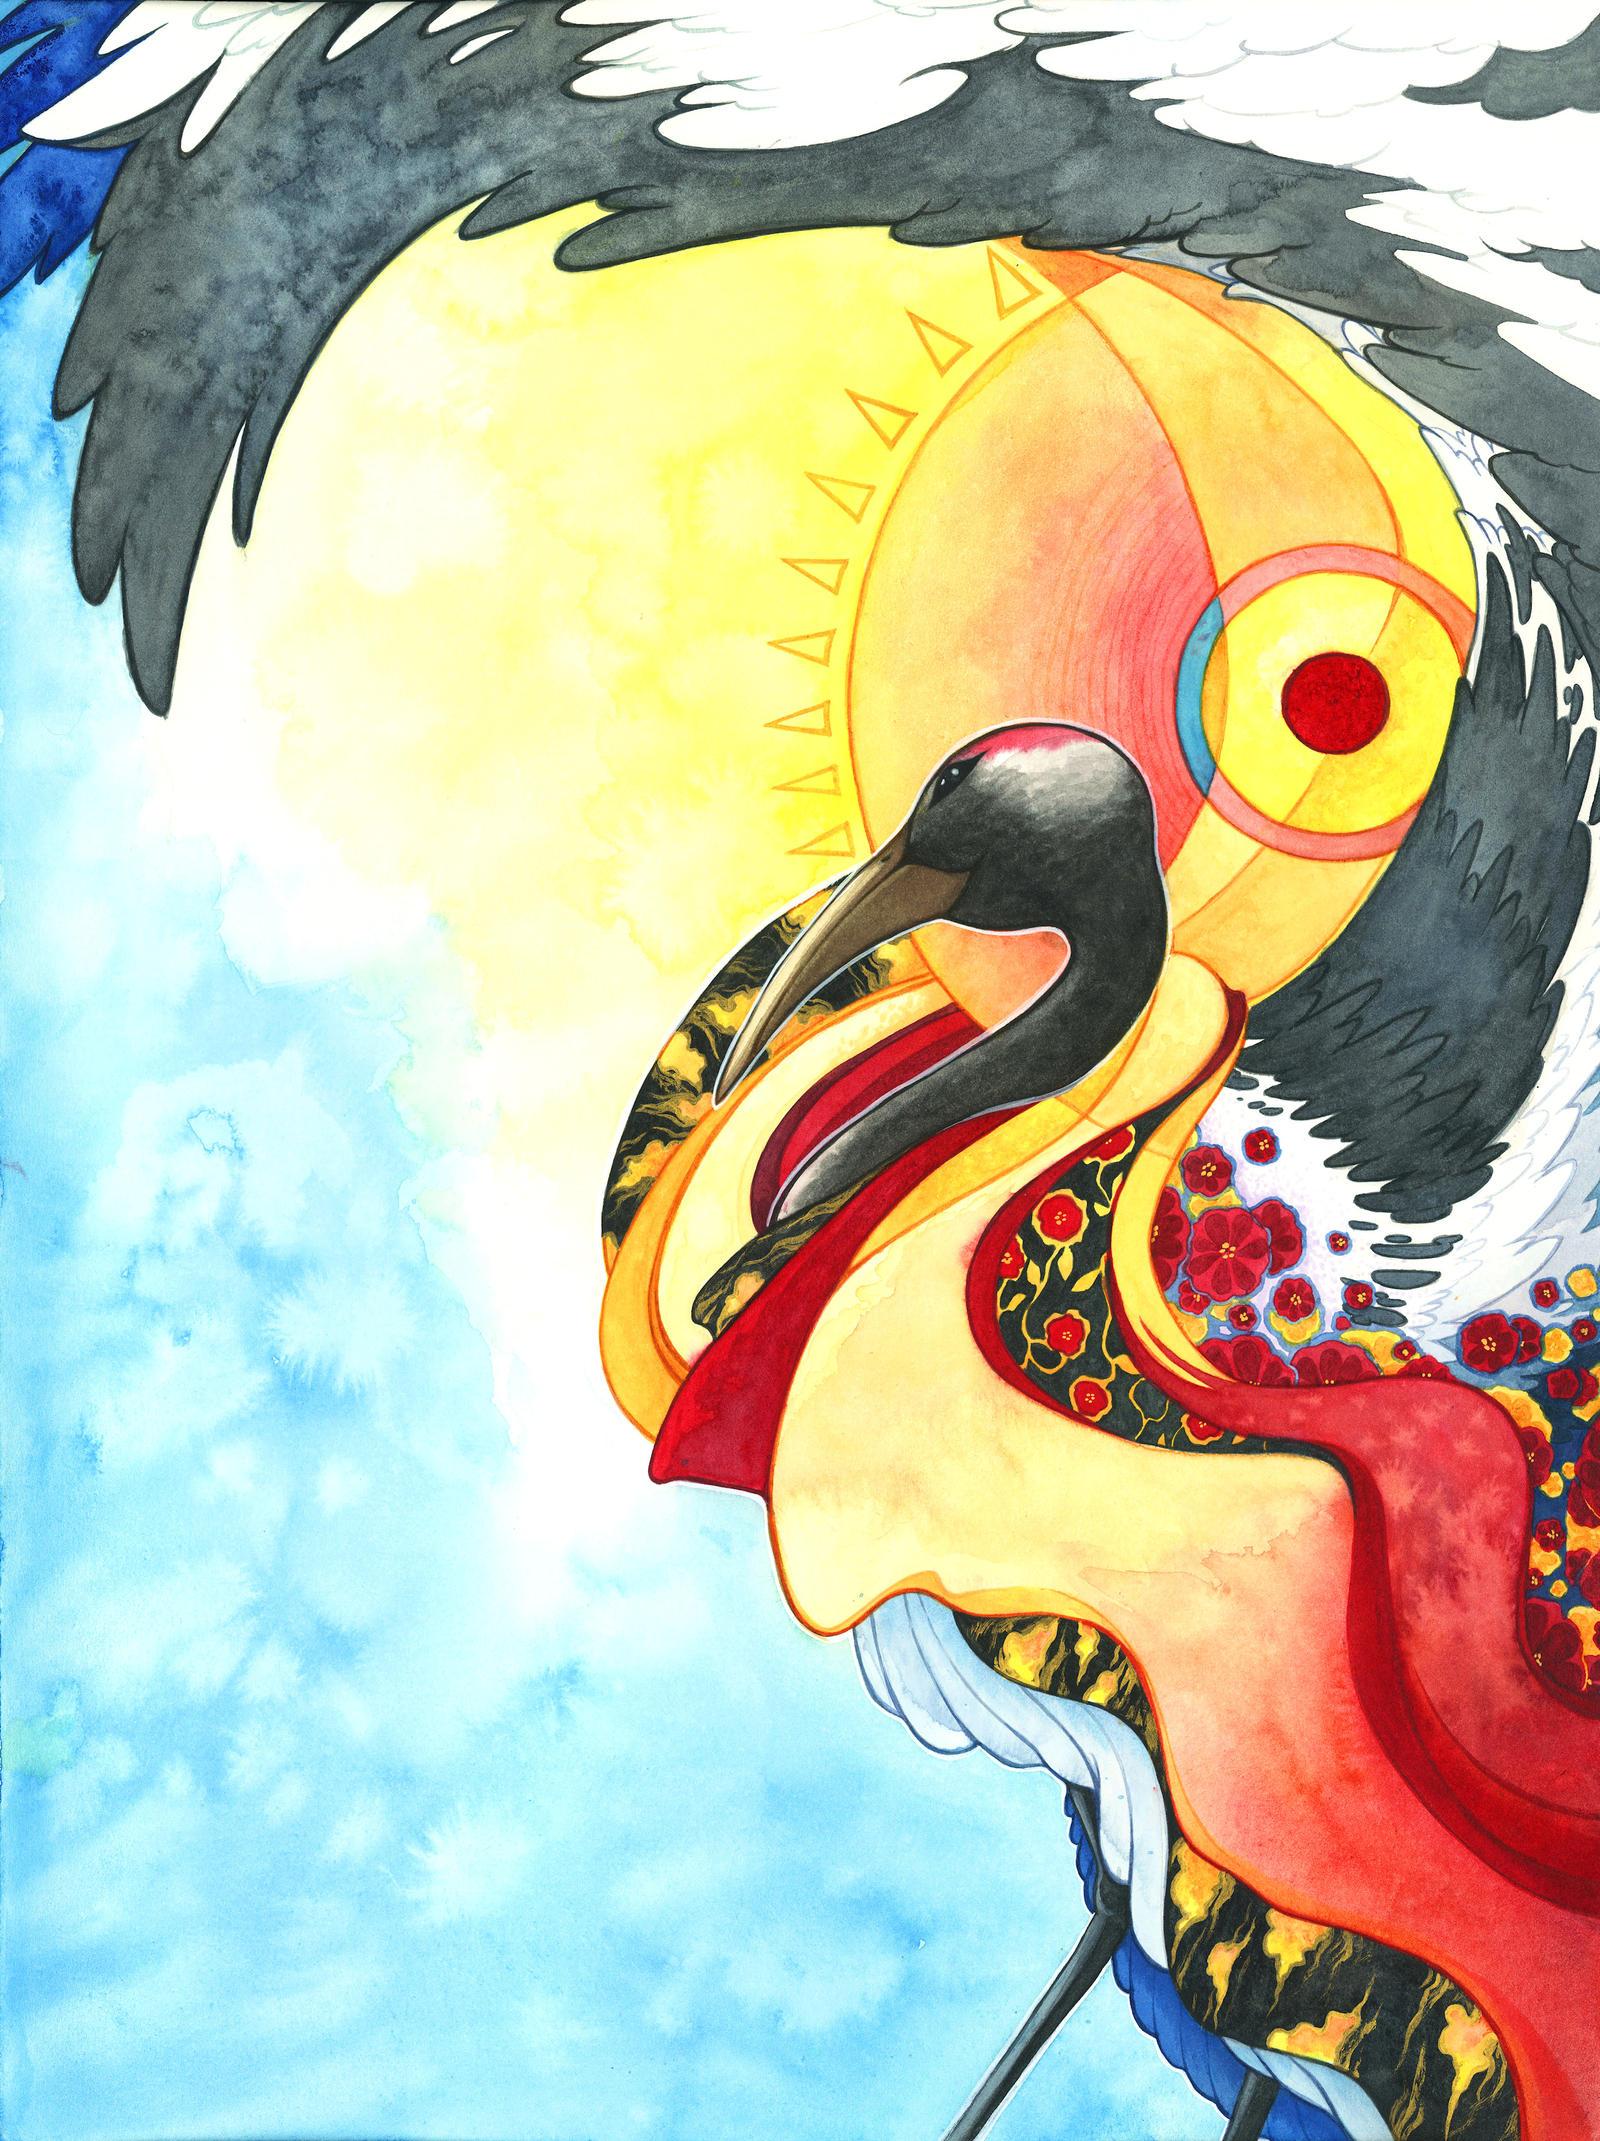 Japan Charity Dance art by mementomoryo